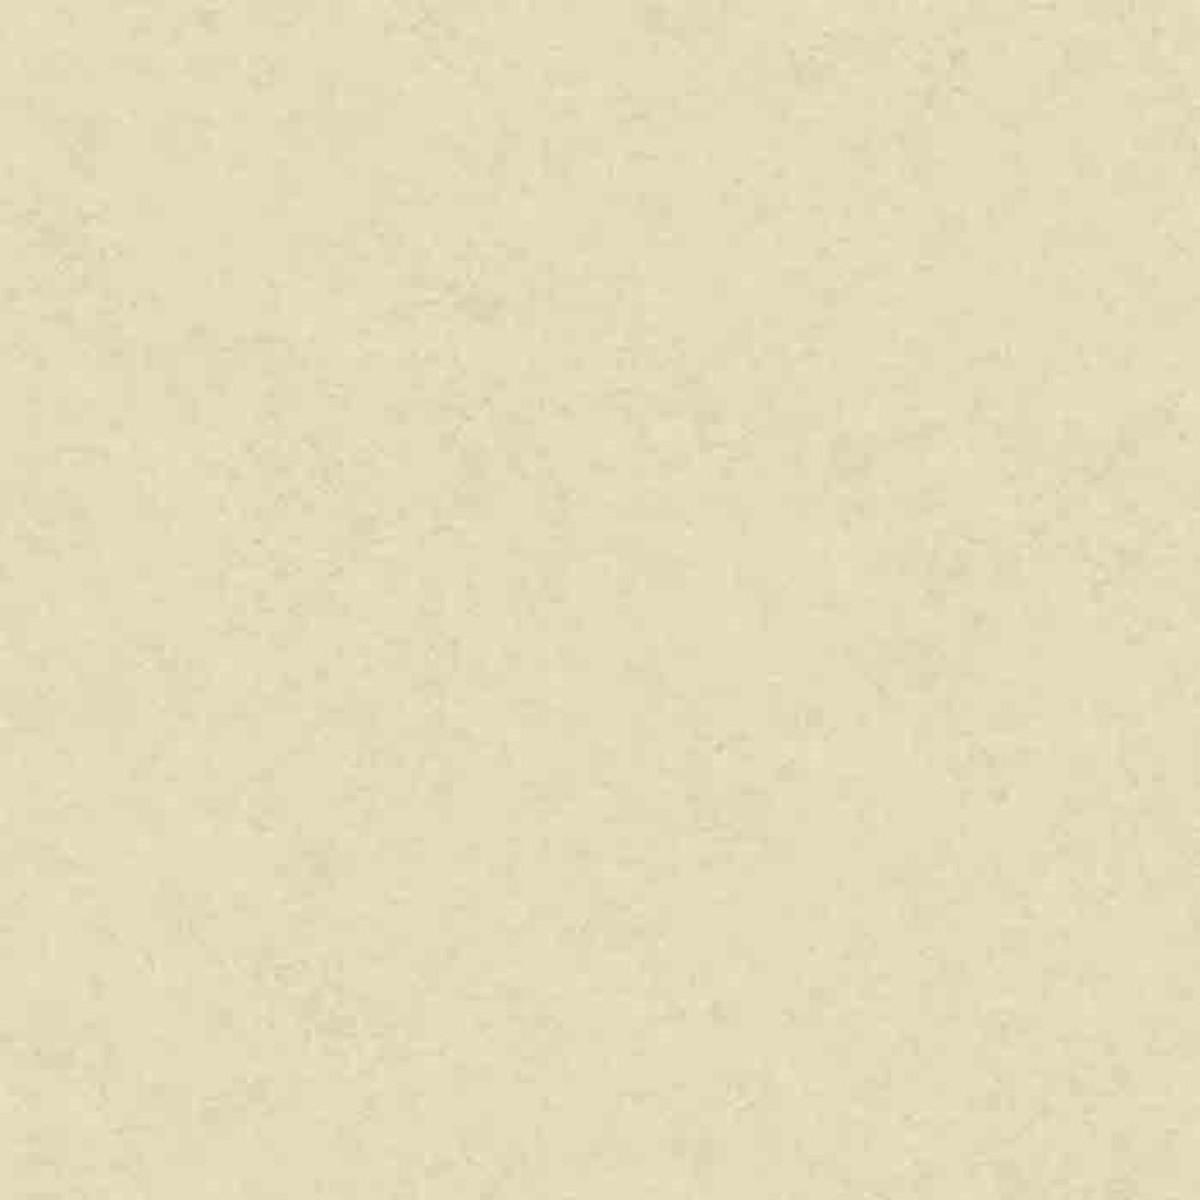 Виниловые обои Paper Partnership бежевые WP0090604 0.52 м